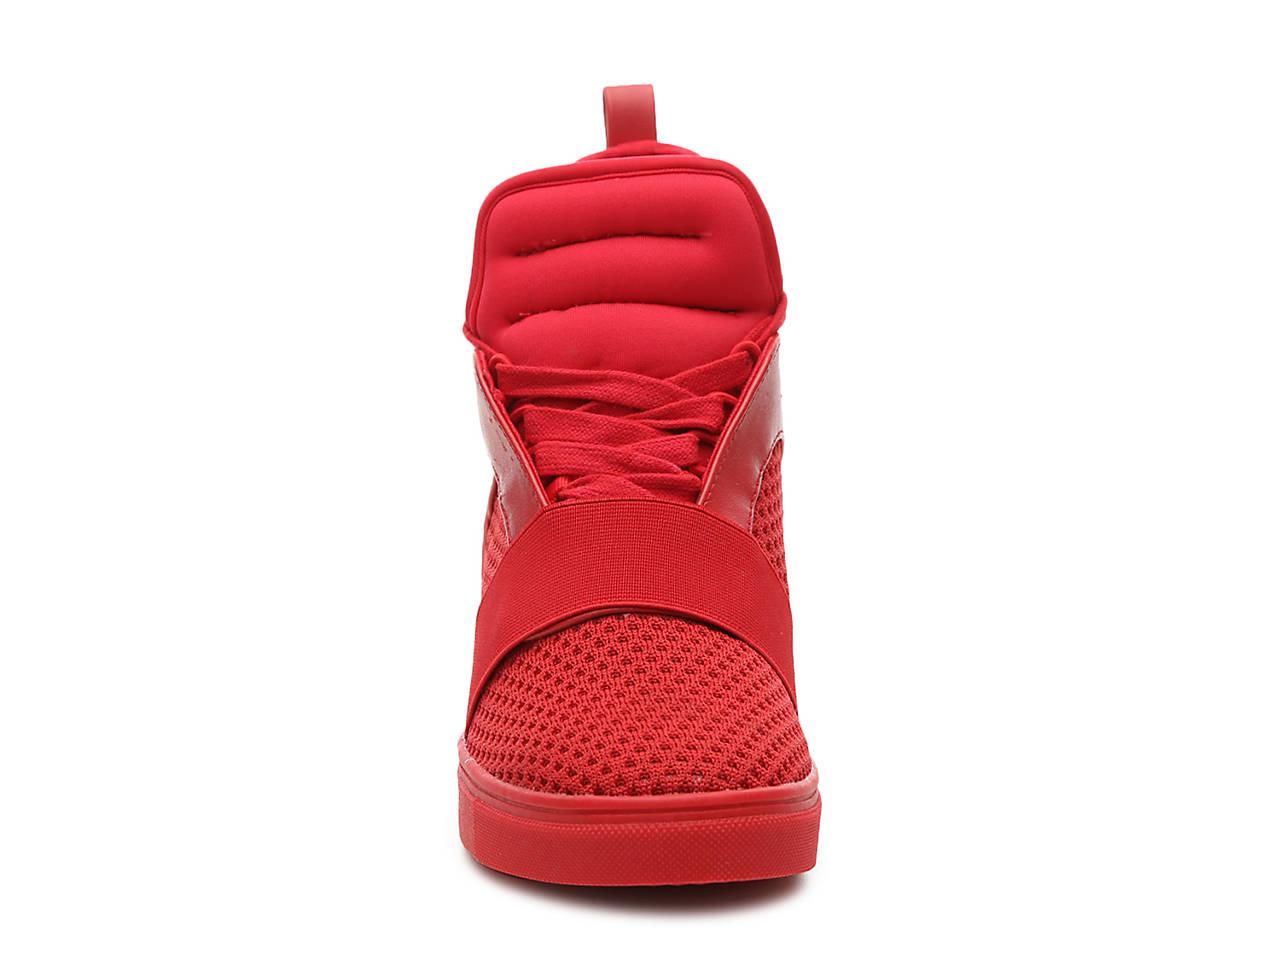 3fcb656a31a Steve Madden Lexi Wedge Sneaker Men s Shoes